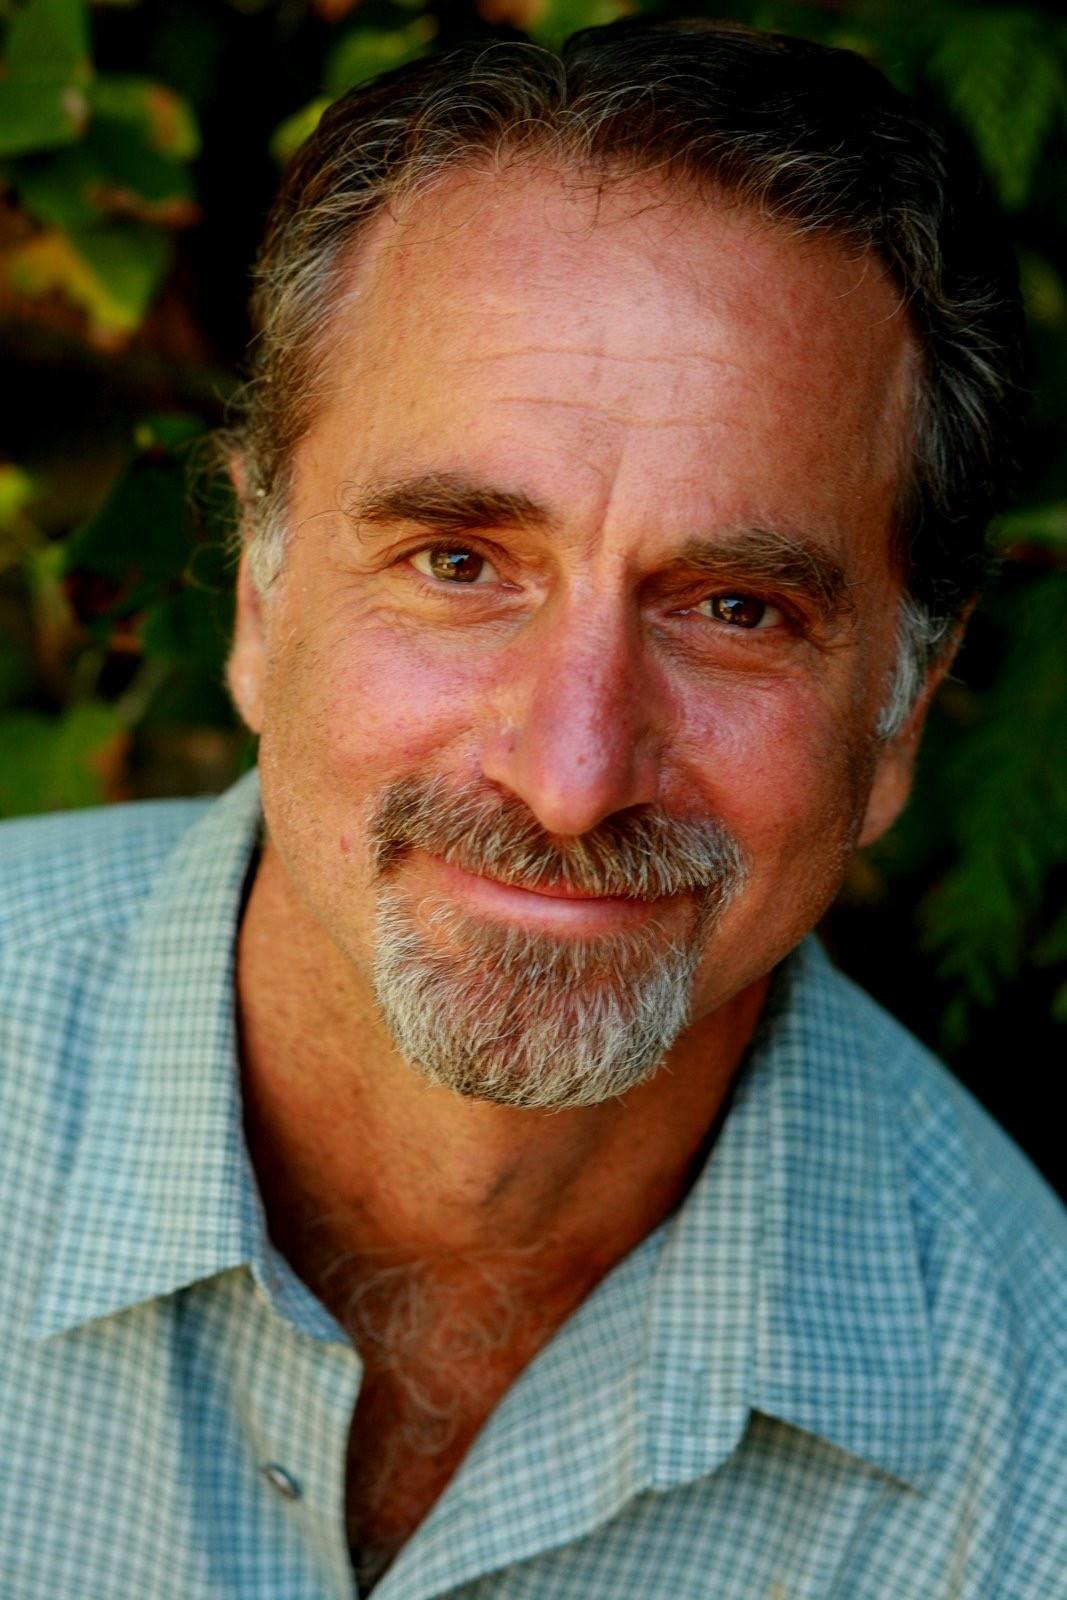 David Weinstock